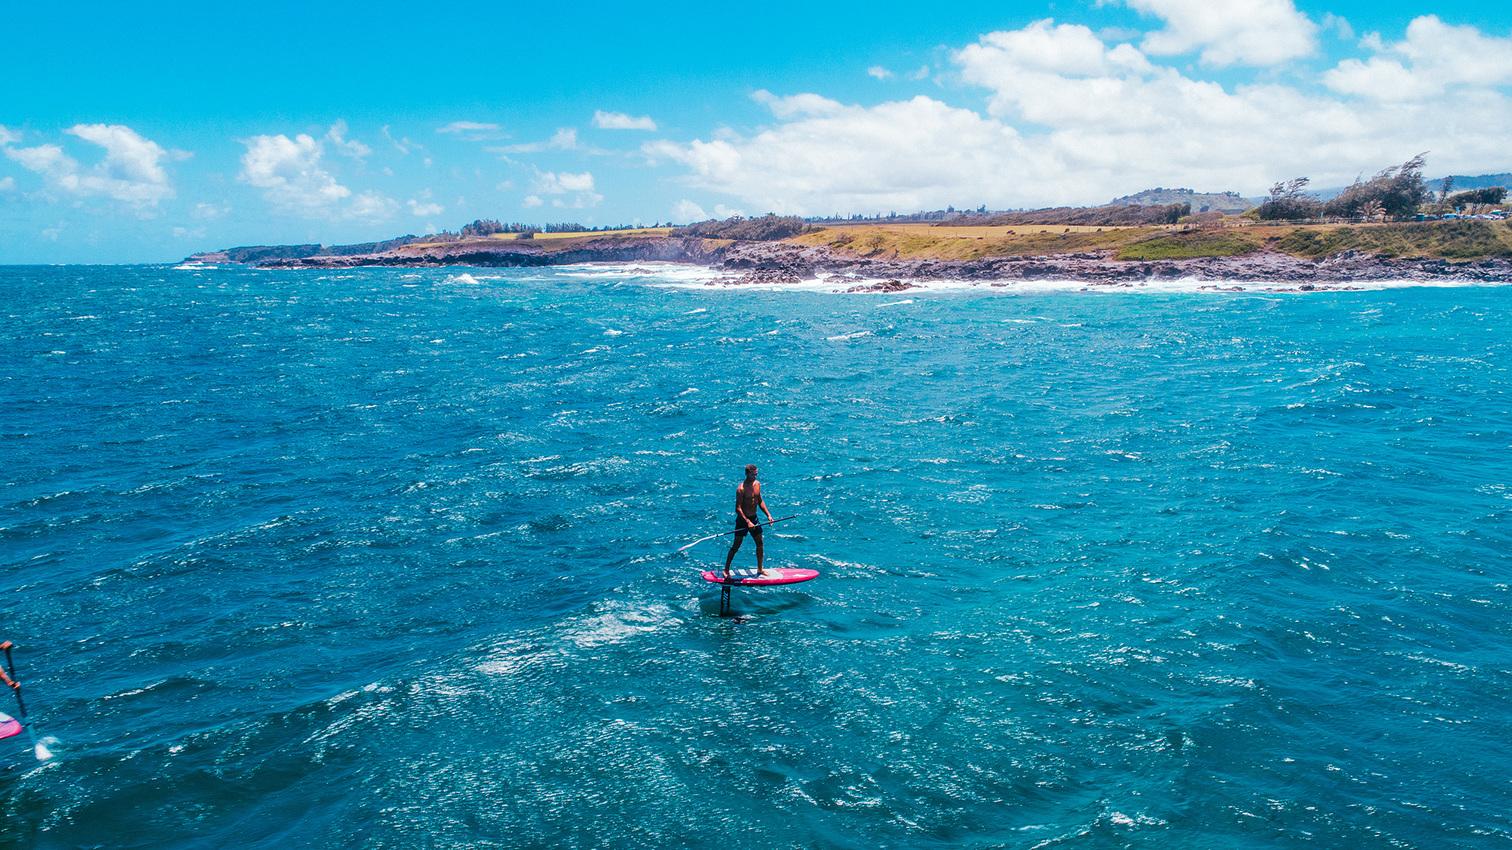 Arthur SkySUP DJI 0072-Maui2019-Fanatic-Duotone-marcusfriedrich.media